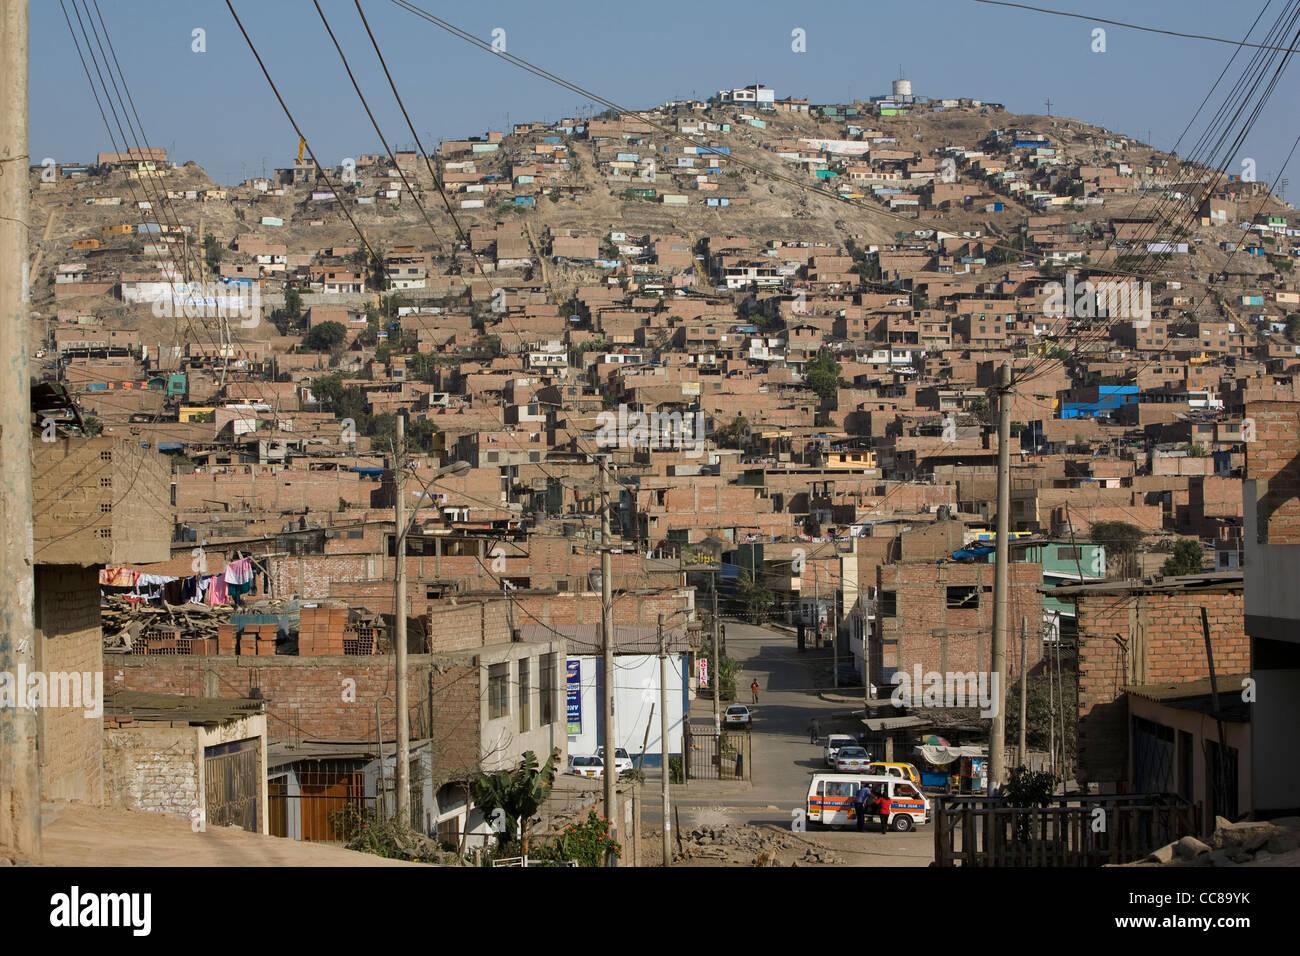 Villa el Salvador is a suburb of Lima, Peru, South America. - Stock Image